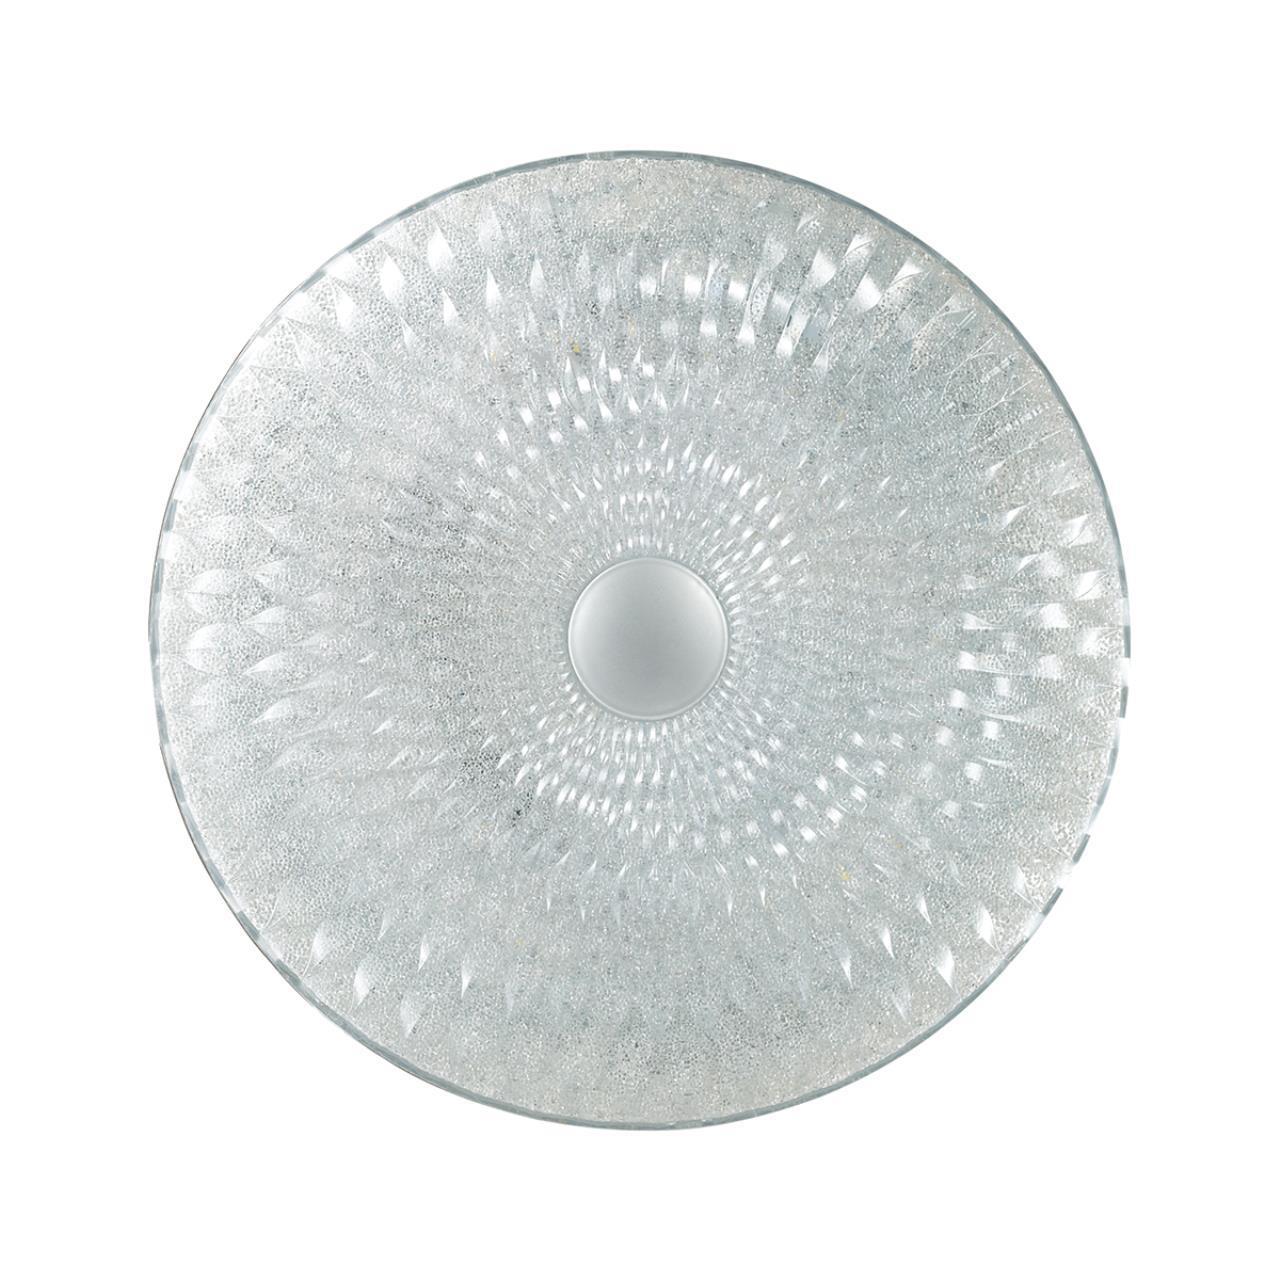 2094/EL SN 046 св-к FIOLA пластик LED 72Вт 3000-6000K D500 IP43 пульт ДУ